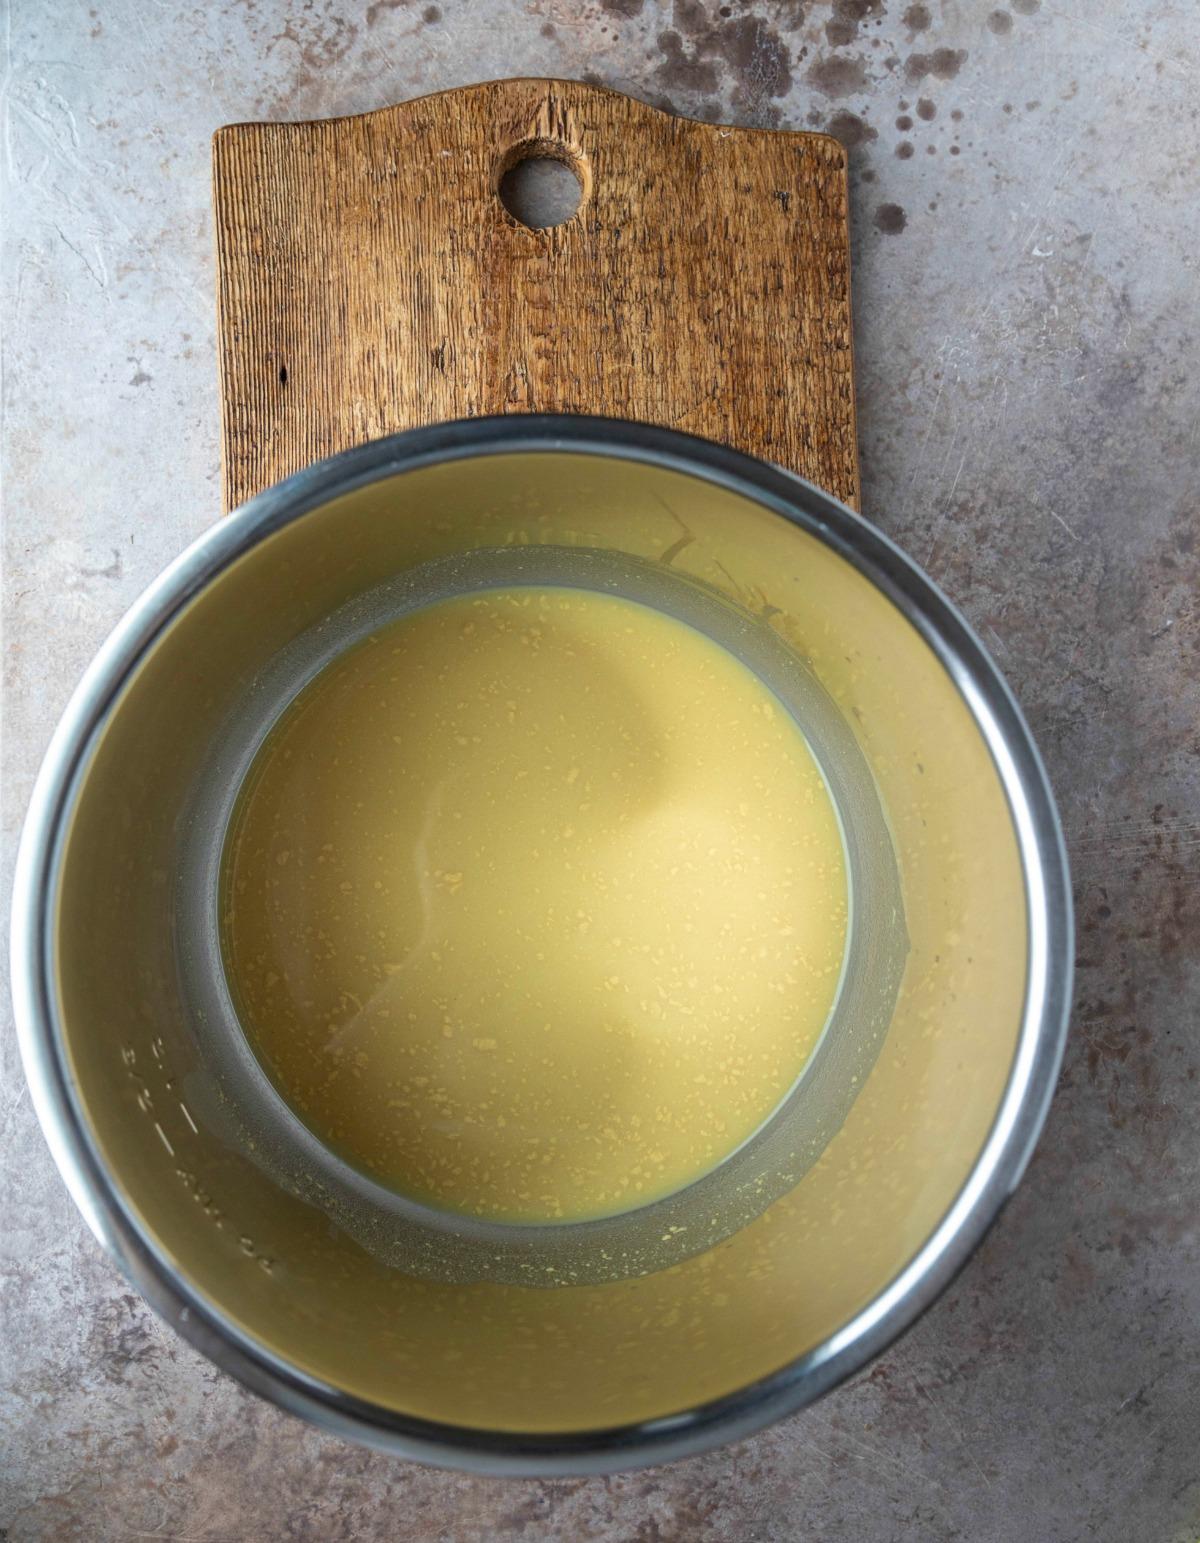 honey mustard sauce in an instant pot inner pot